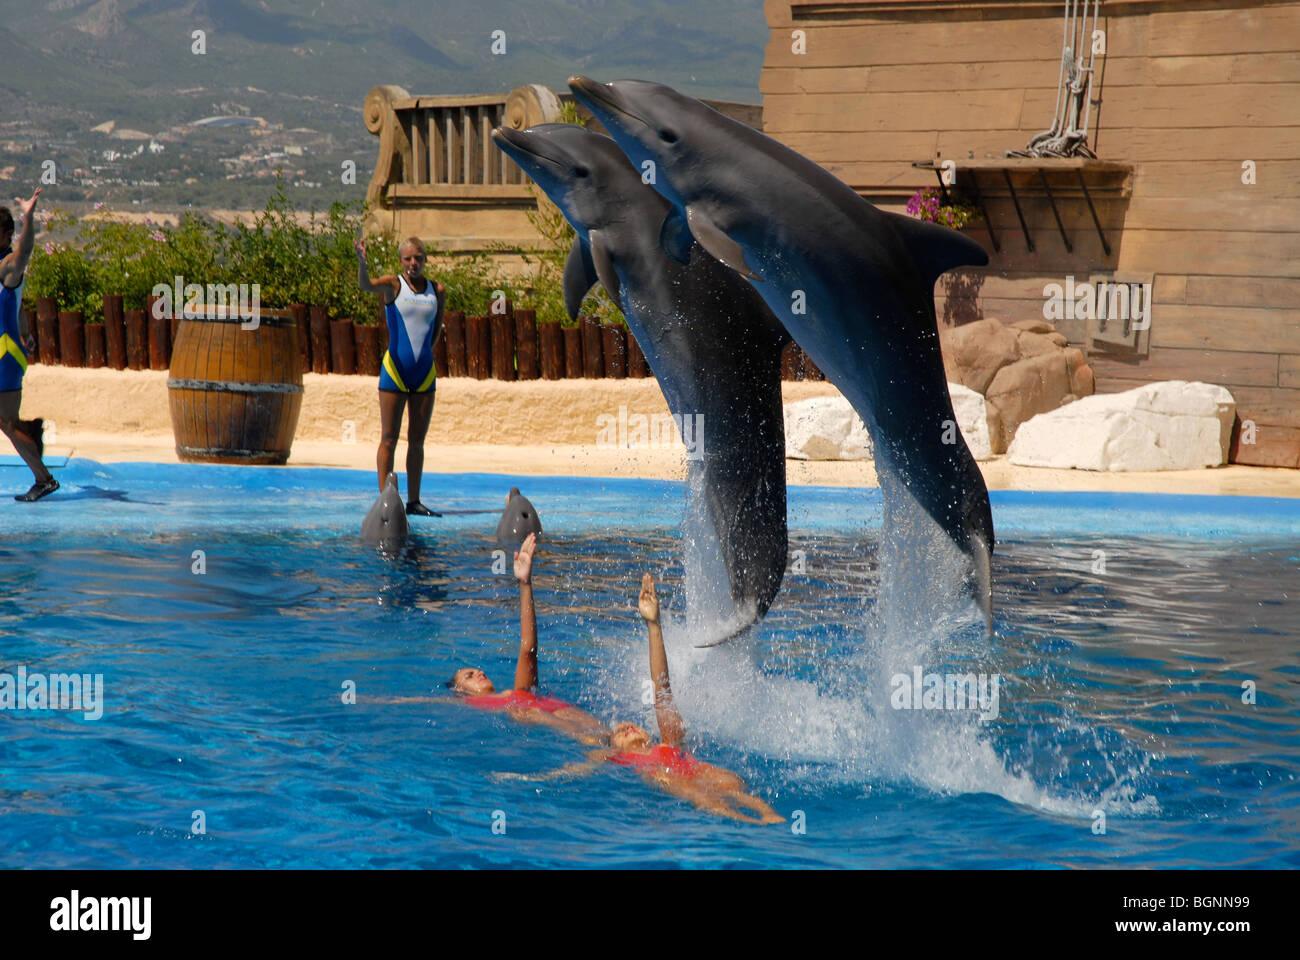 dolphins jumping at Dolphin Show, Mundomar, Benidorm, Alicante Province, Comunidad Valenciana, Spain Stock Photo